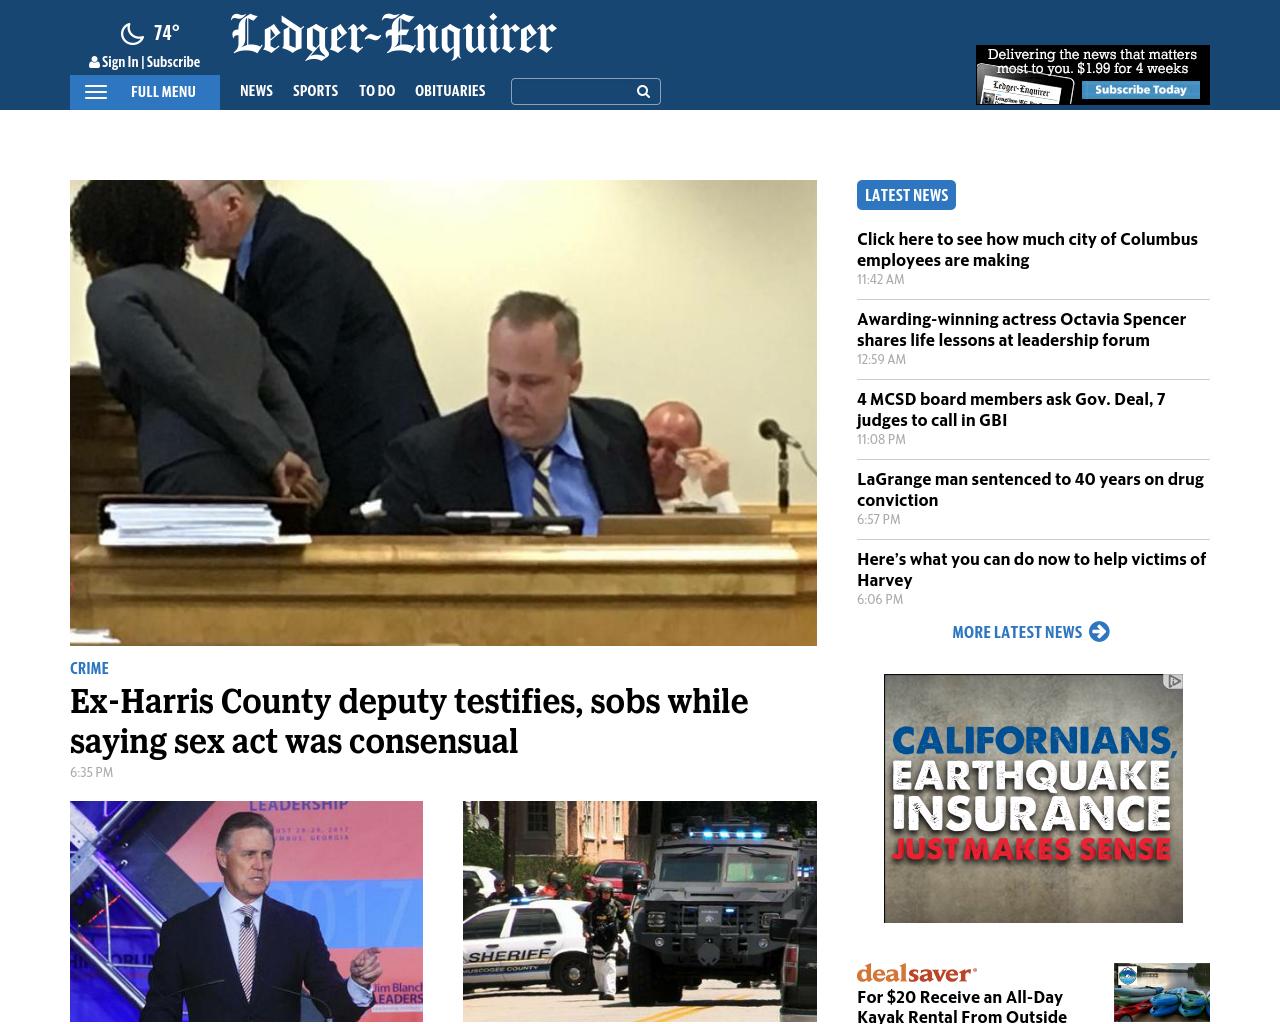 Ledger-Enquirer-Advertising-Reviews-Pricing